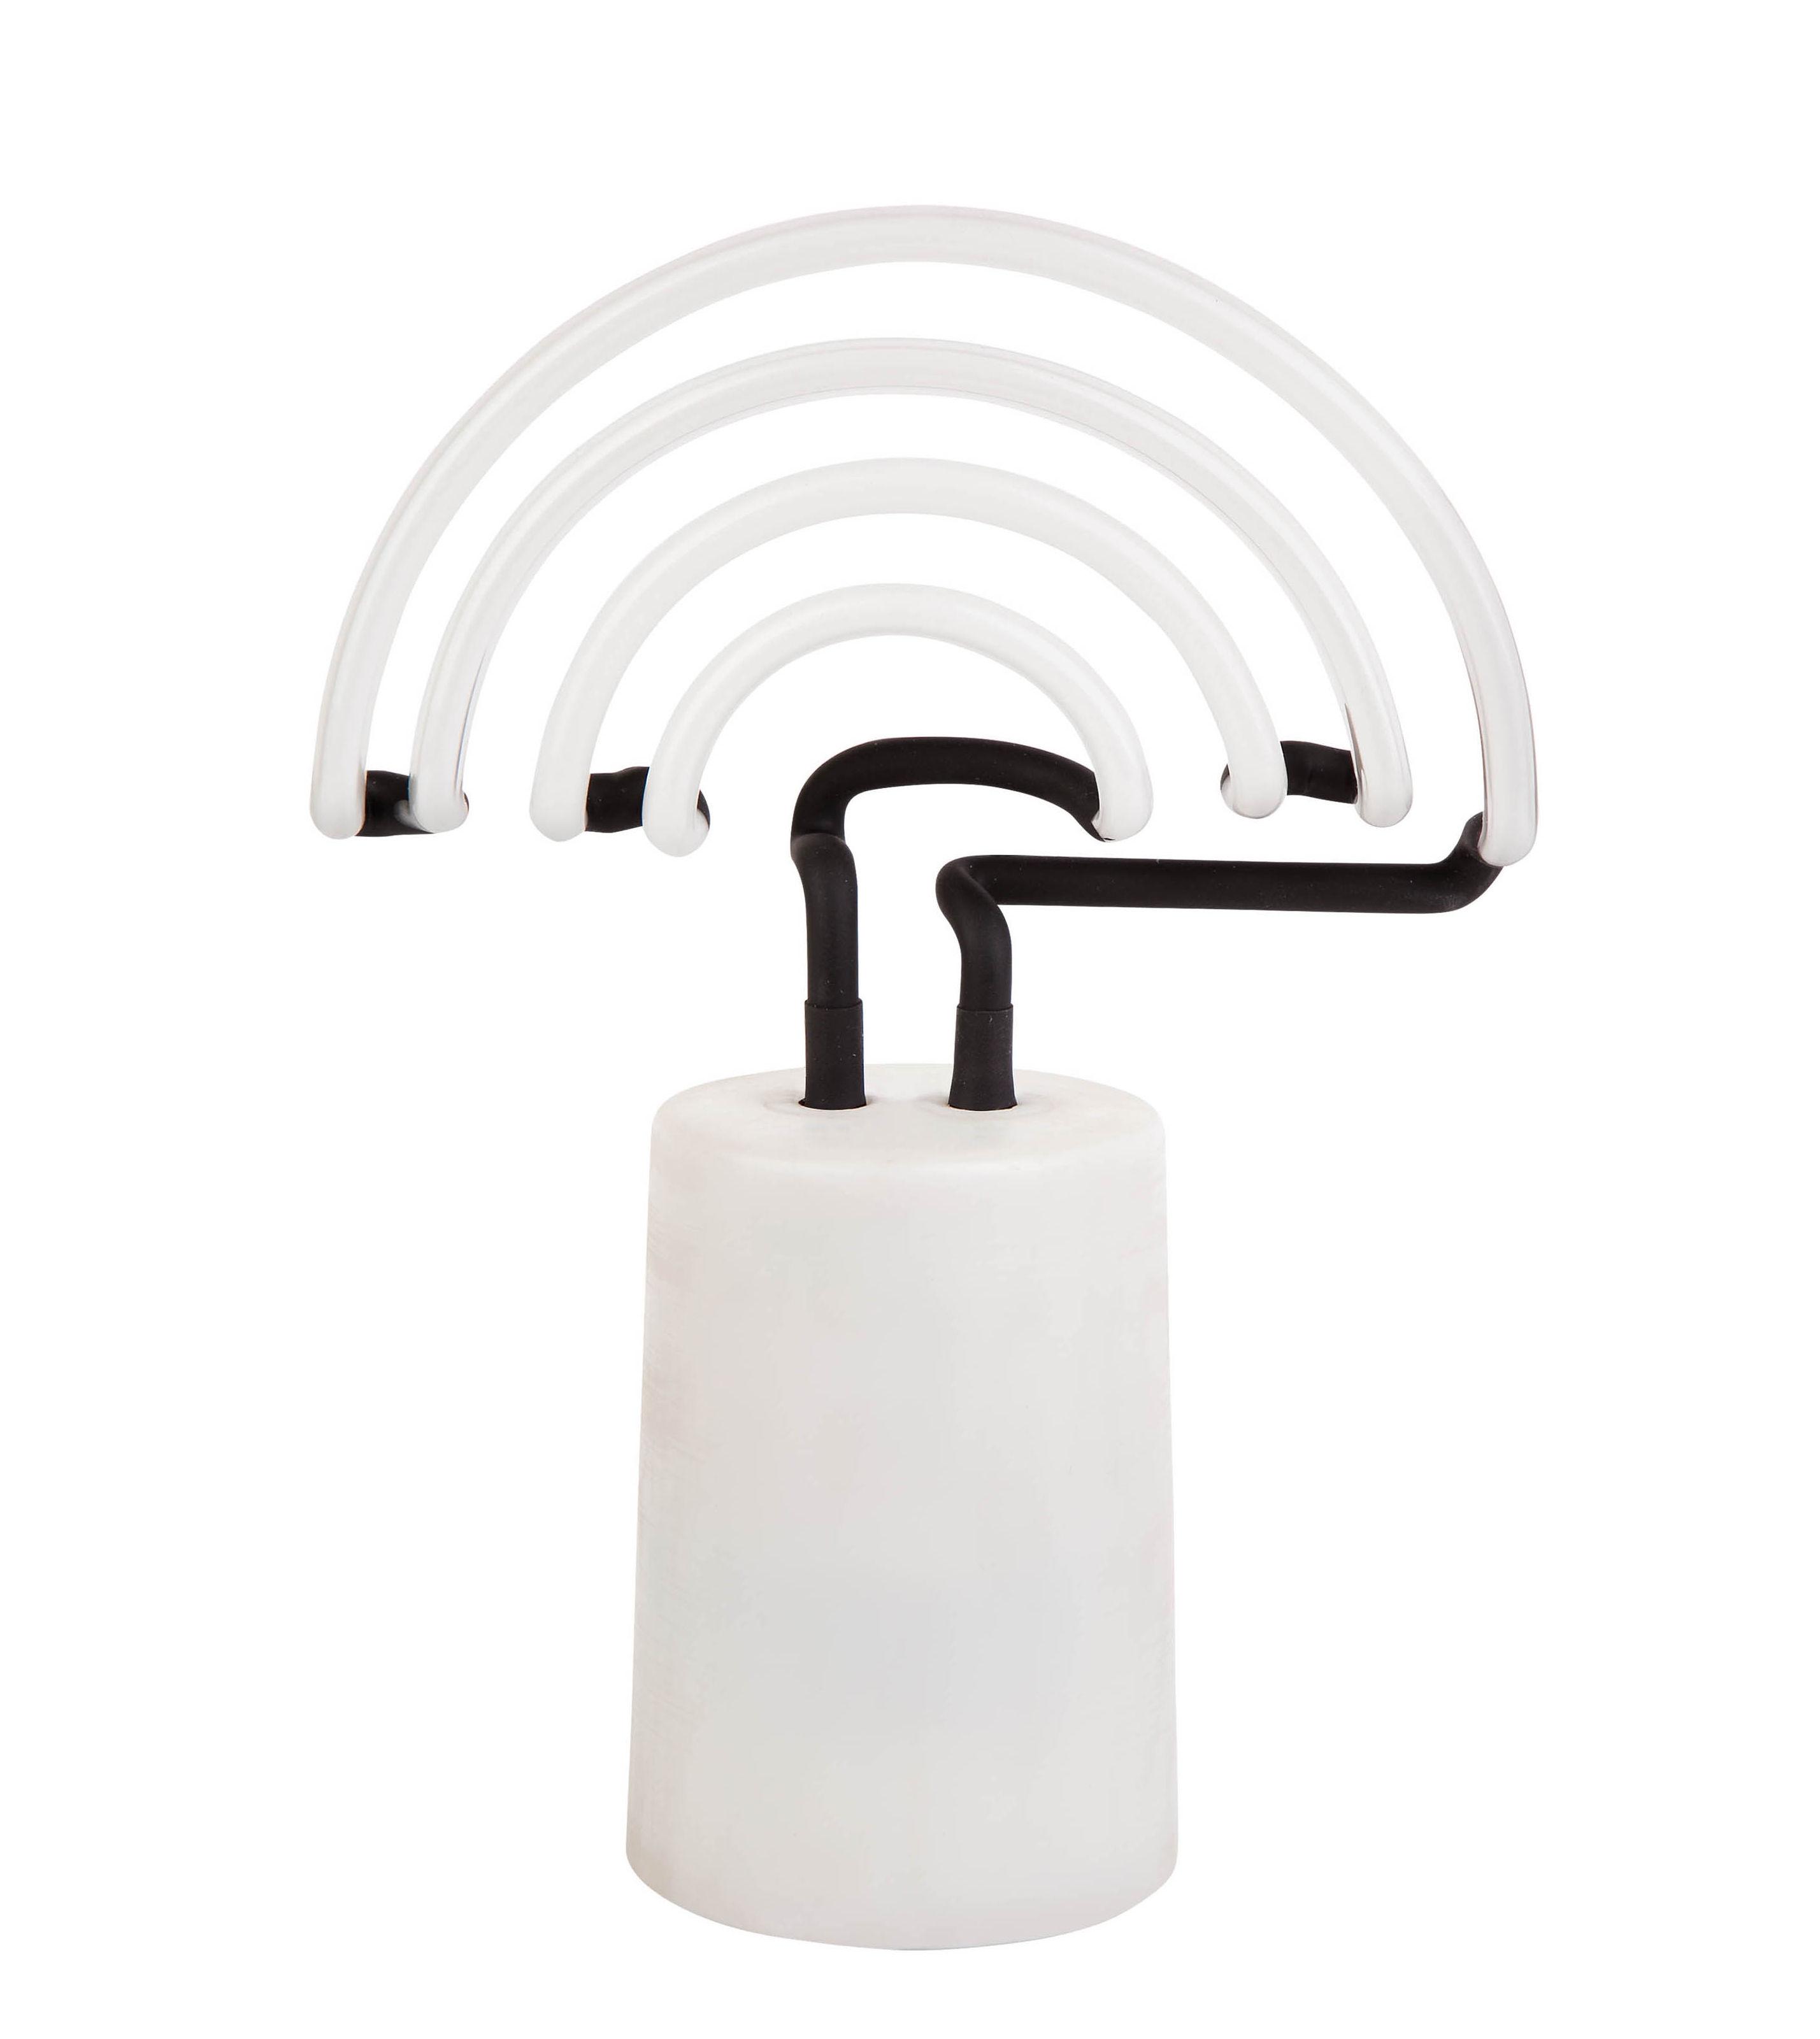 Neon Arc-en-ciel Small / H 23 cm   Sunnylife   Lampe ohne Kabel